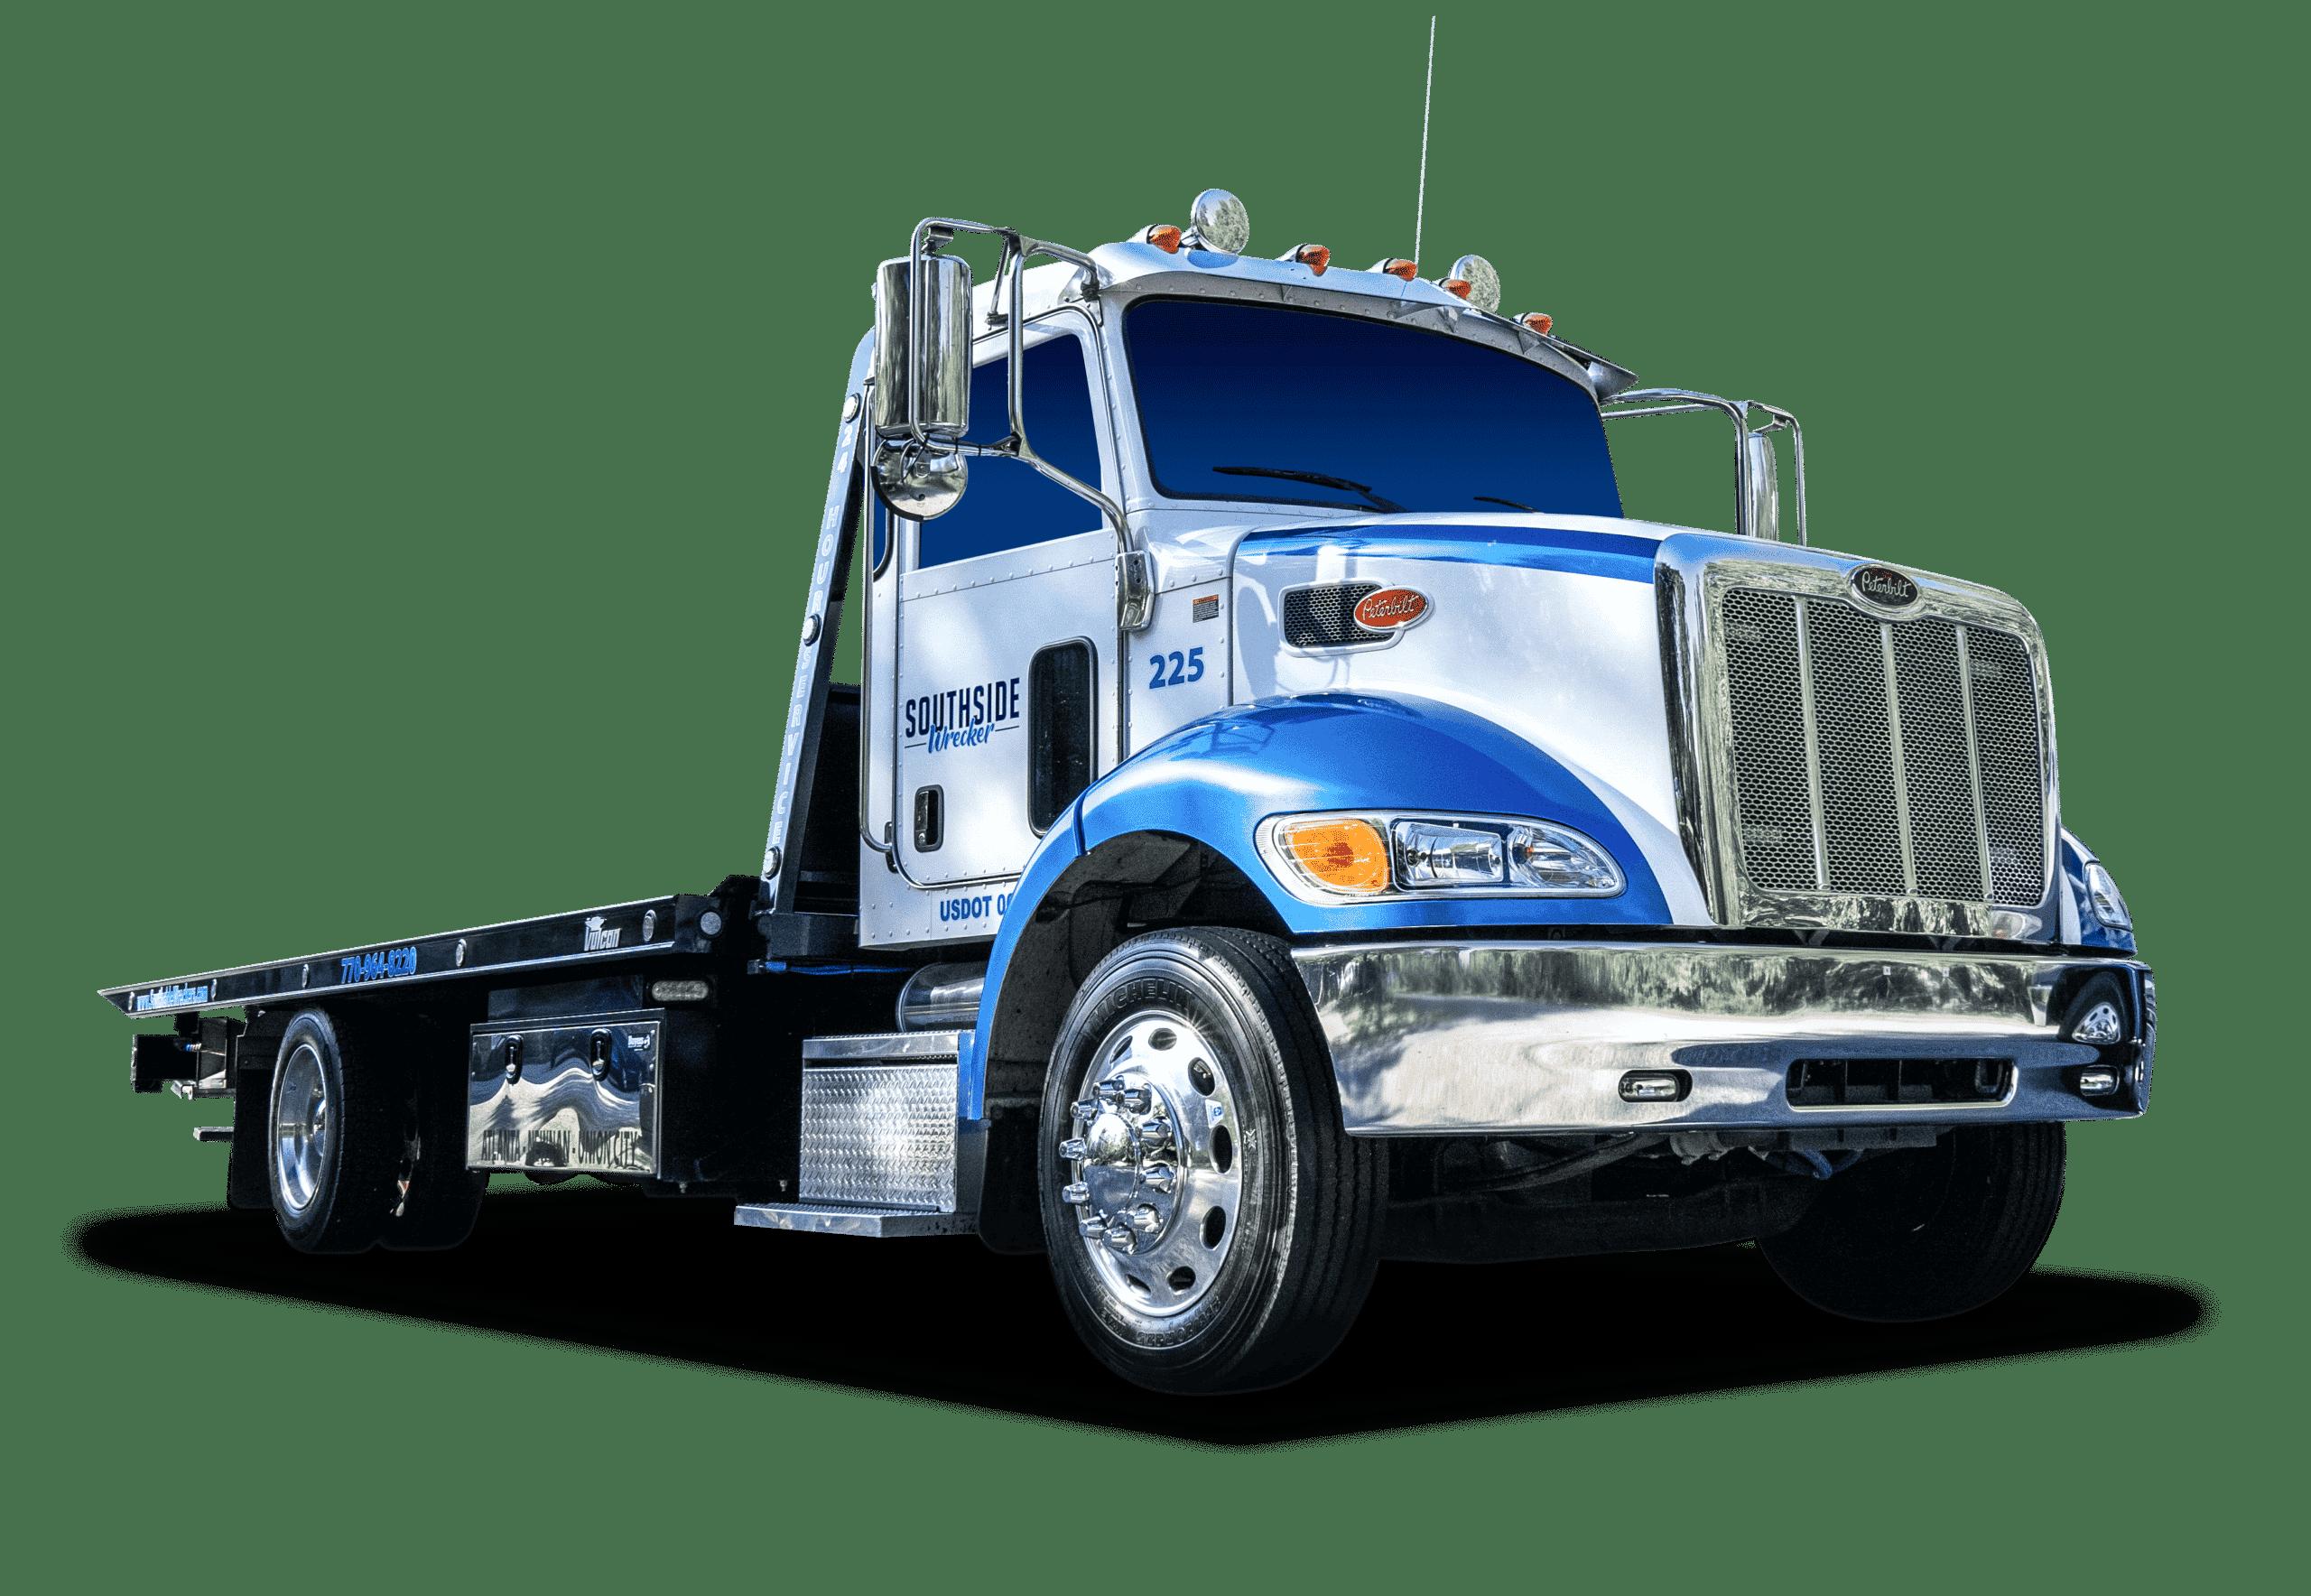 Truck 225